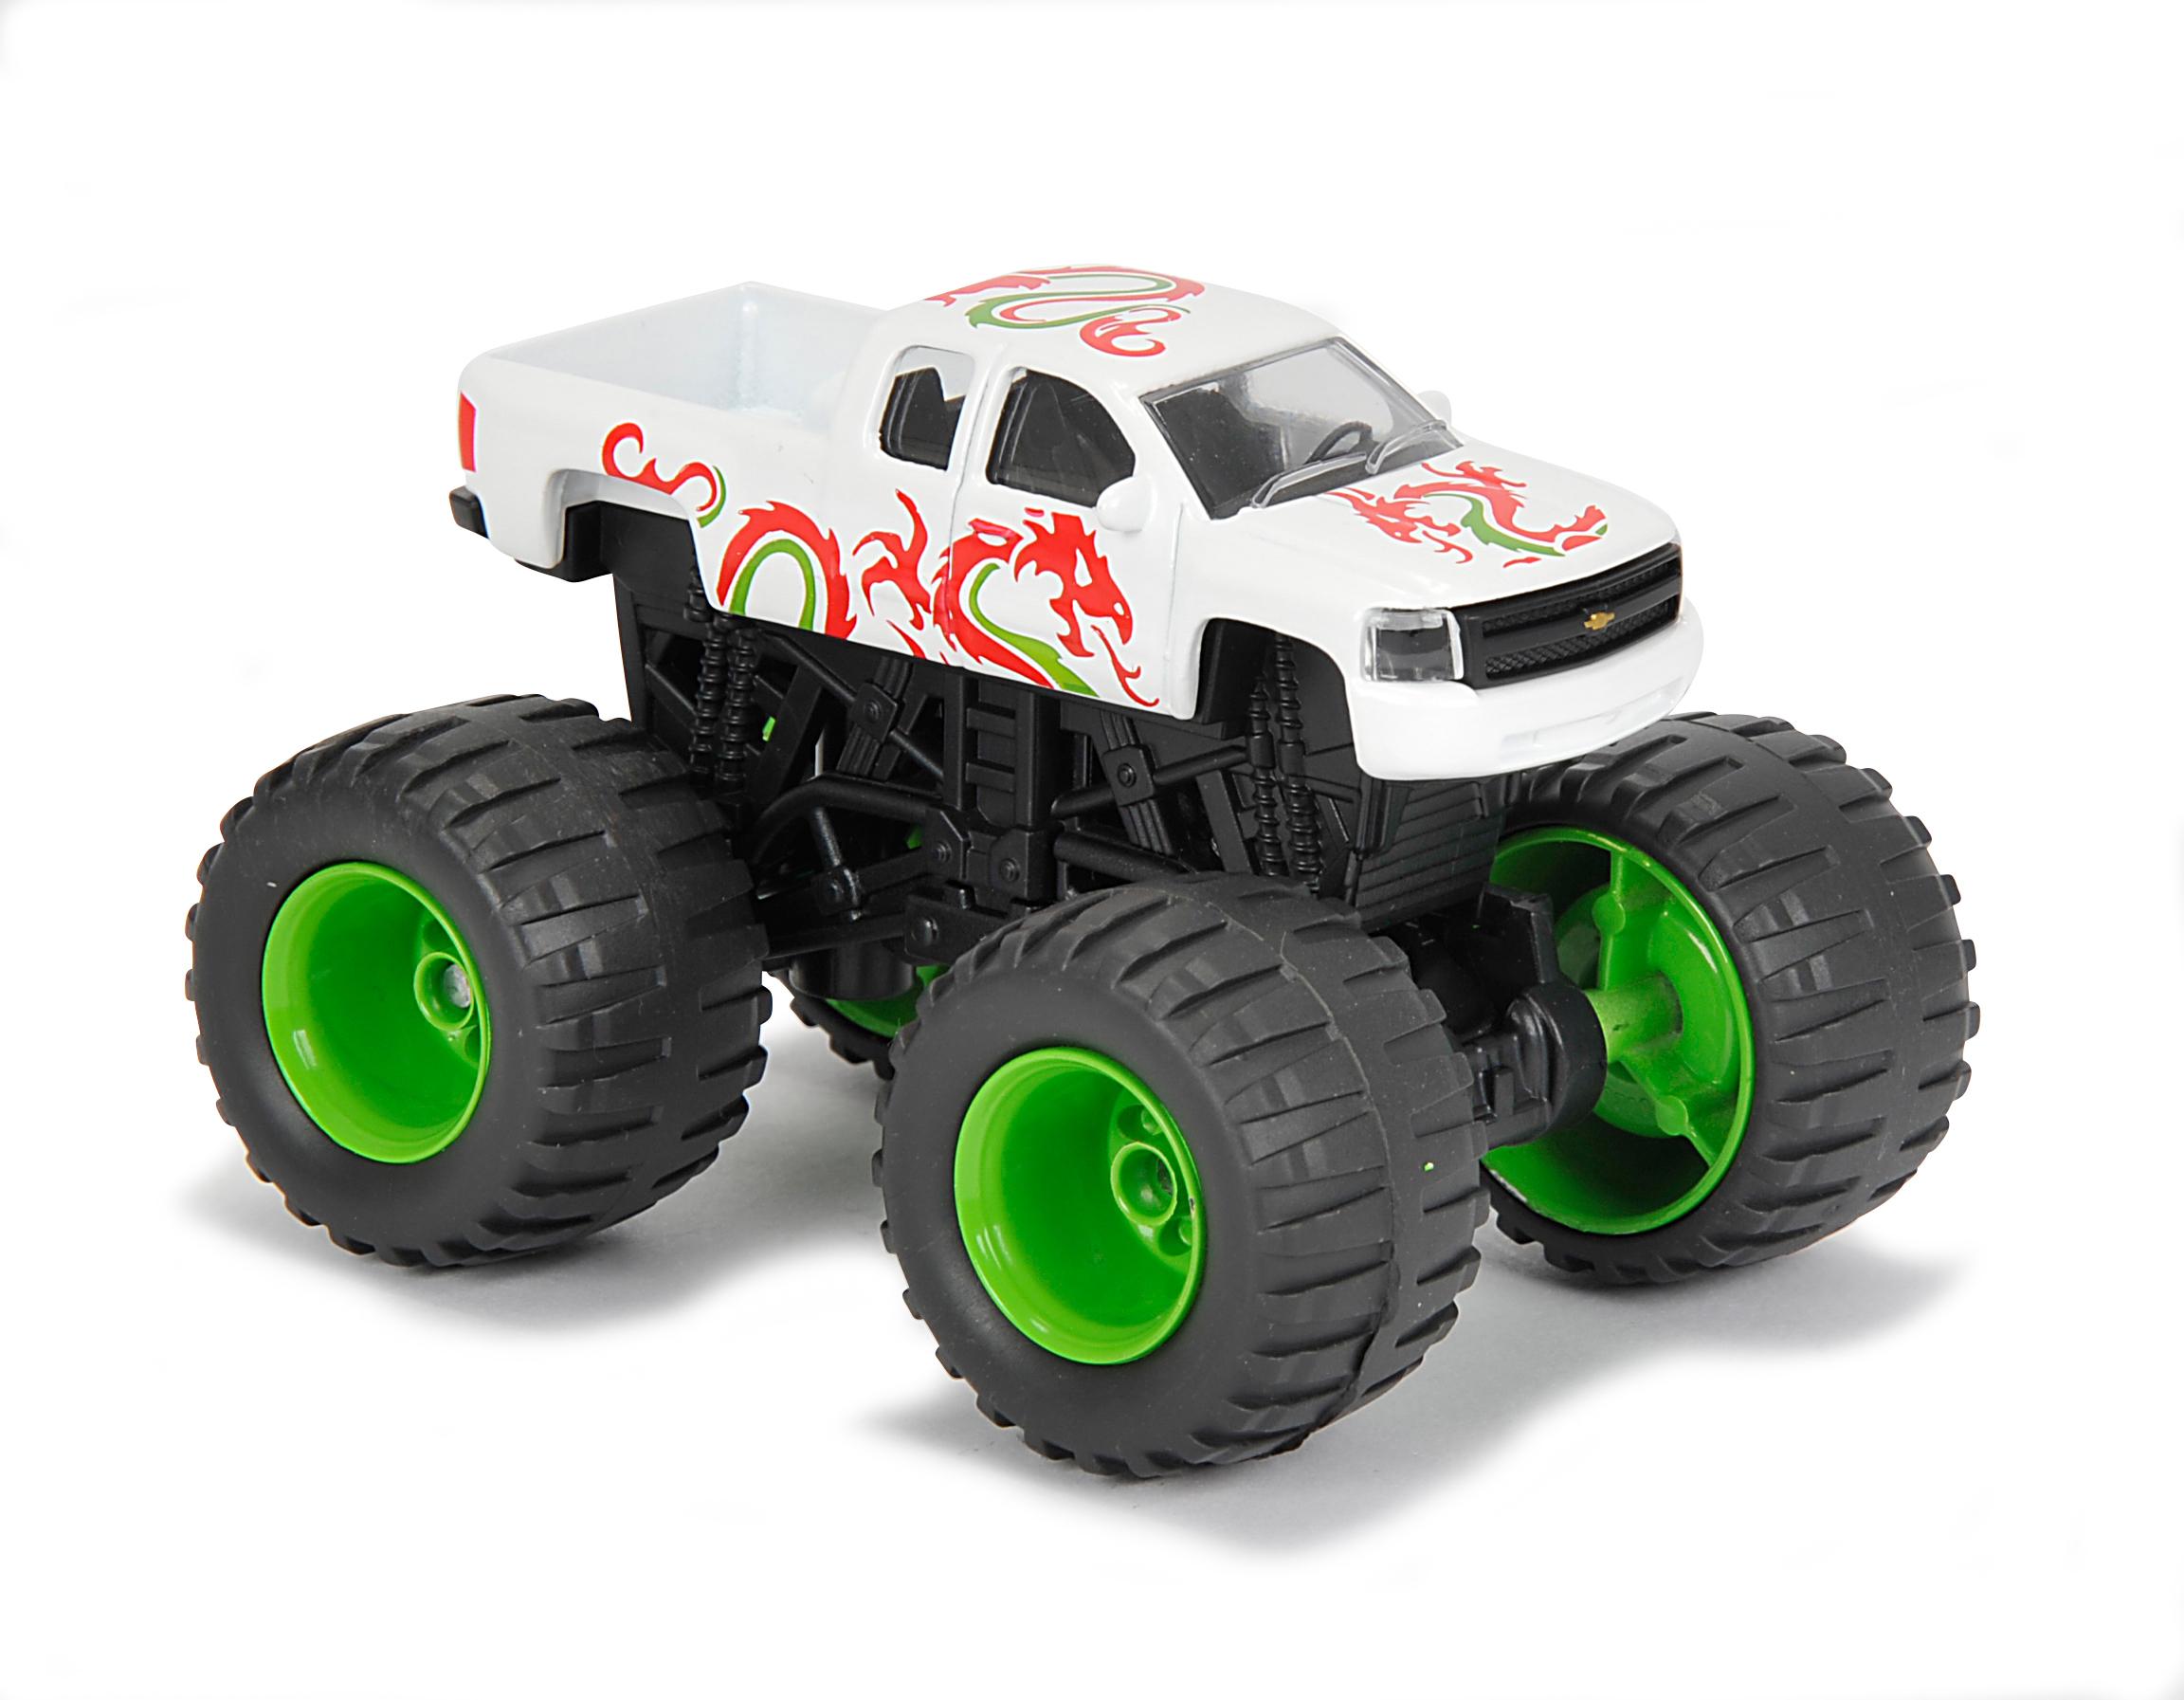 монстр трак машина фото игрушки можно смело